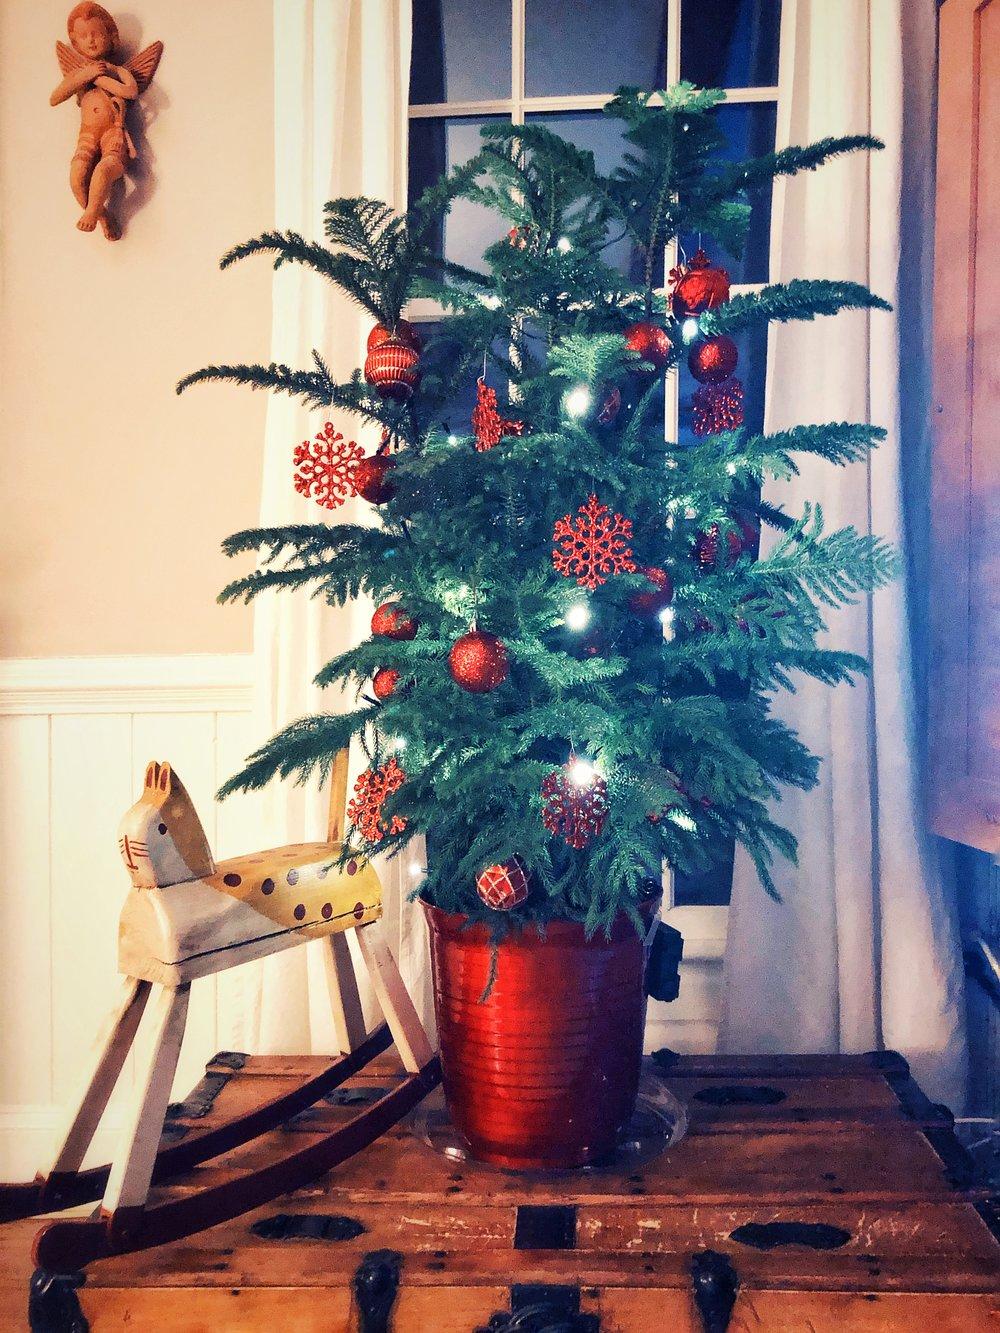 Heidi's first Christmas.